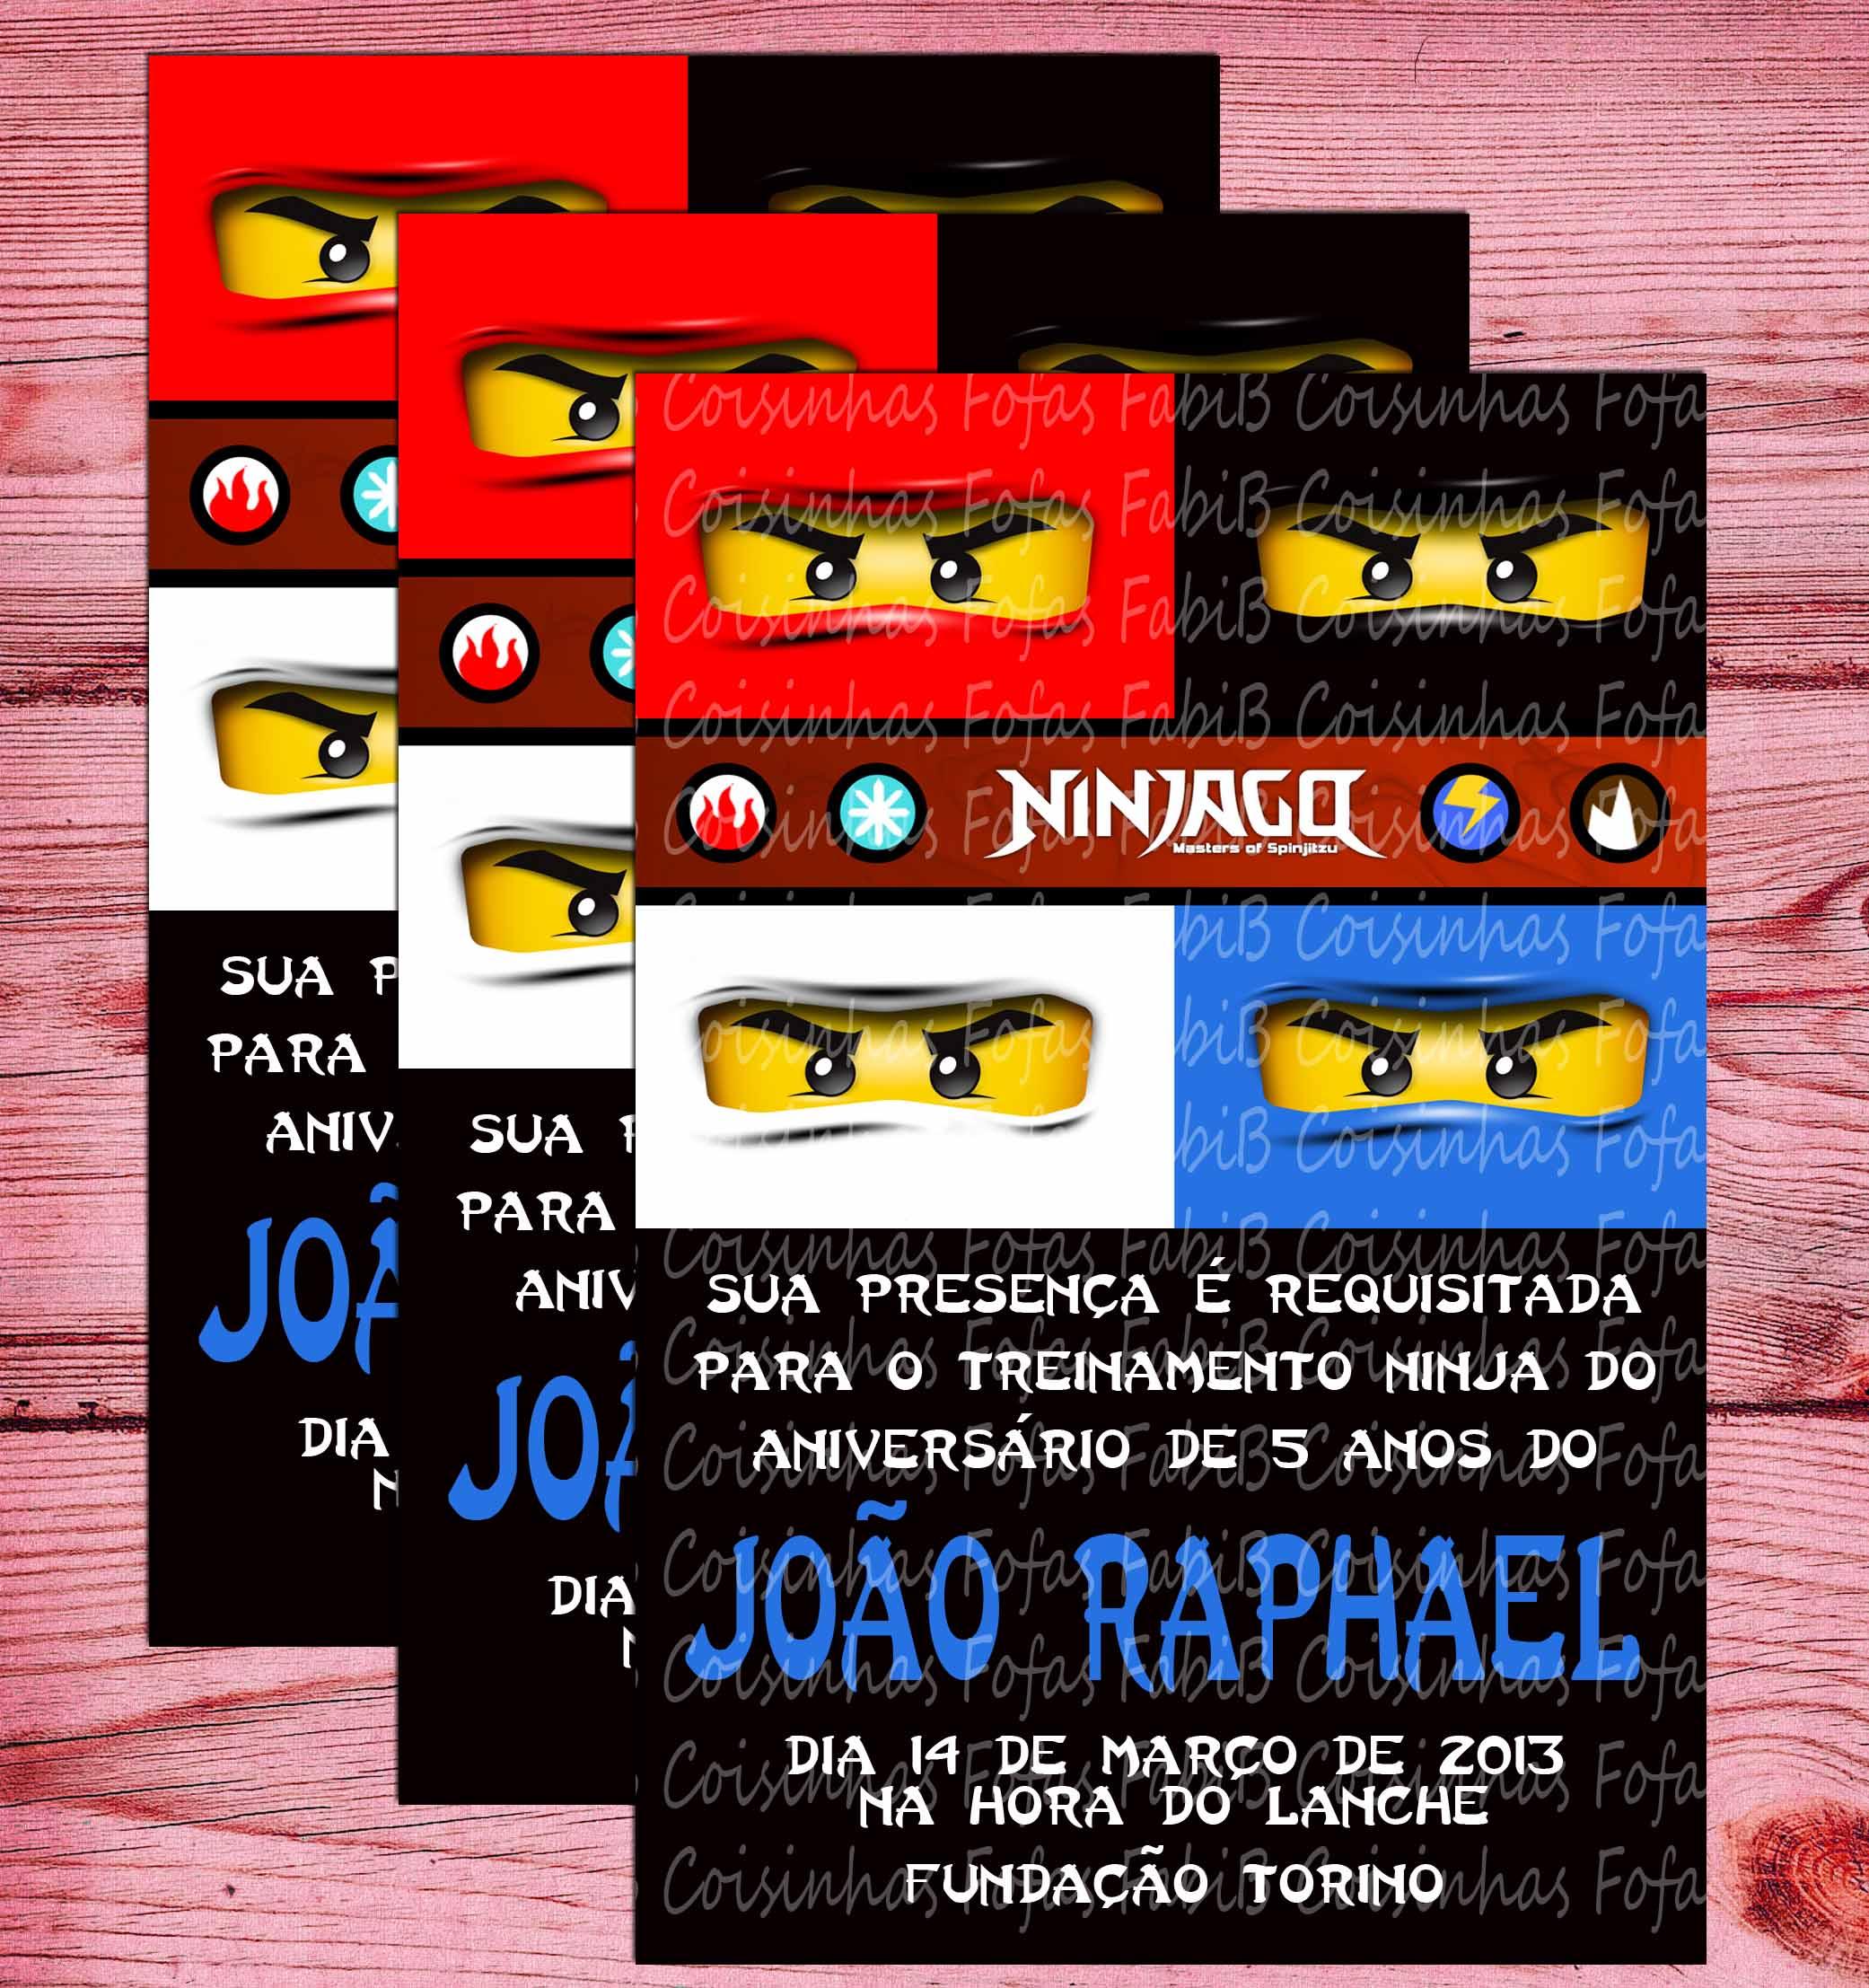 Convite Ninjago No Elo7 Coisinhas Fofas 3d3238